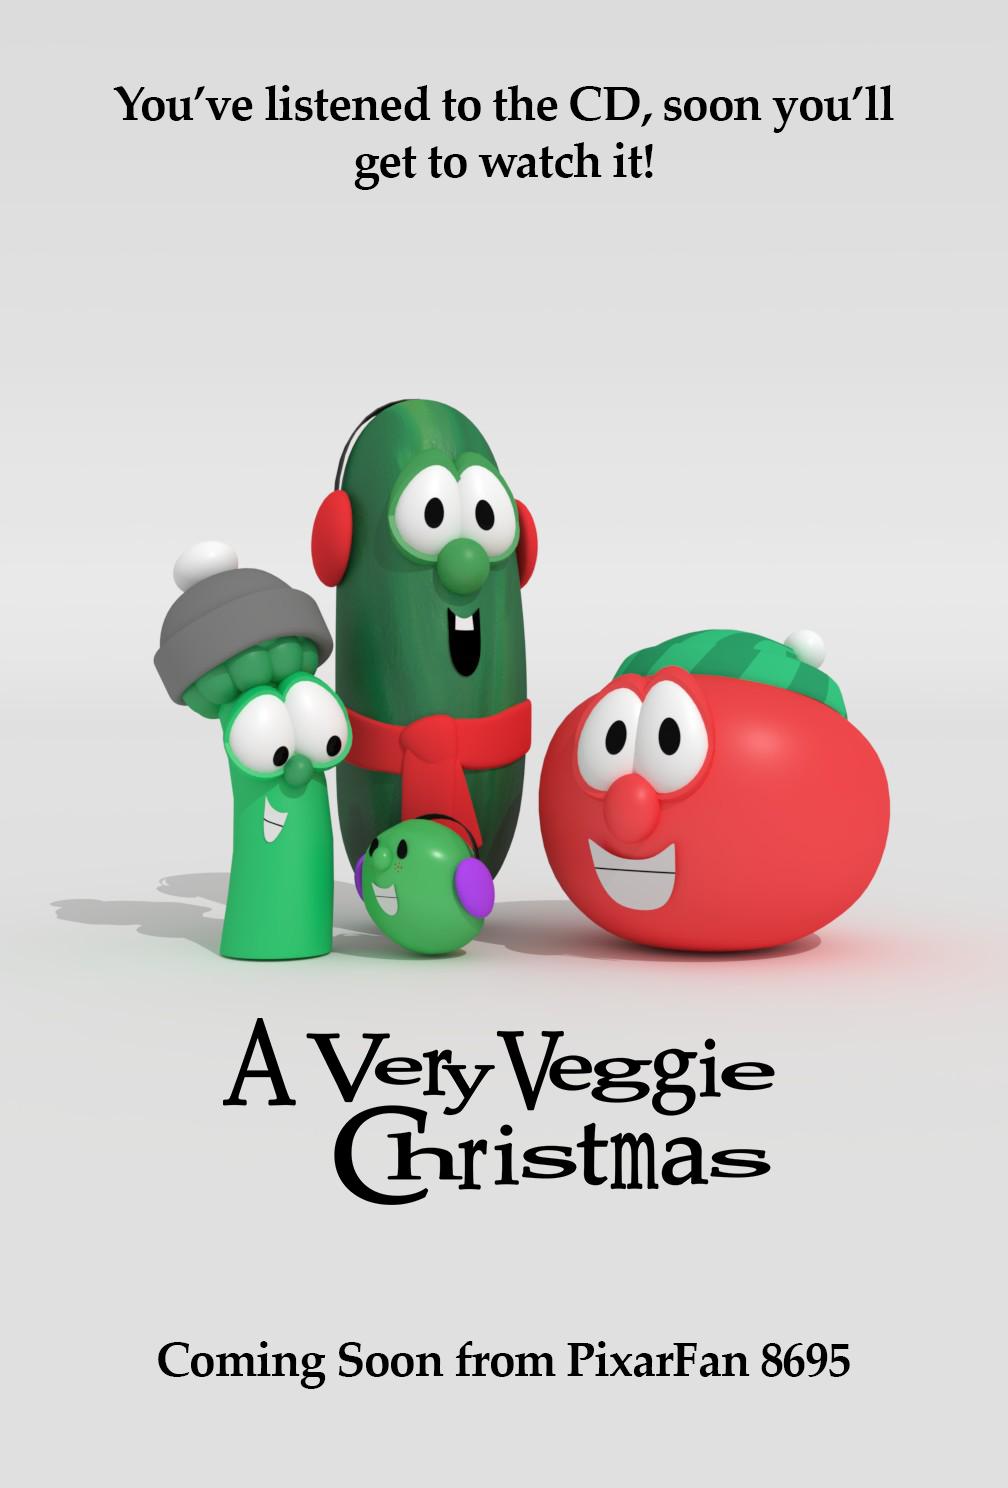 A Very Veggie Christmas.A Very Veggie Christmas Teaser Poster By Luxoveggiedude9302